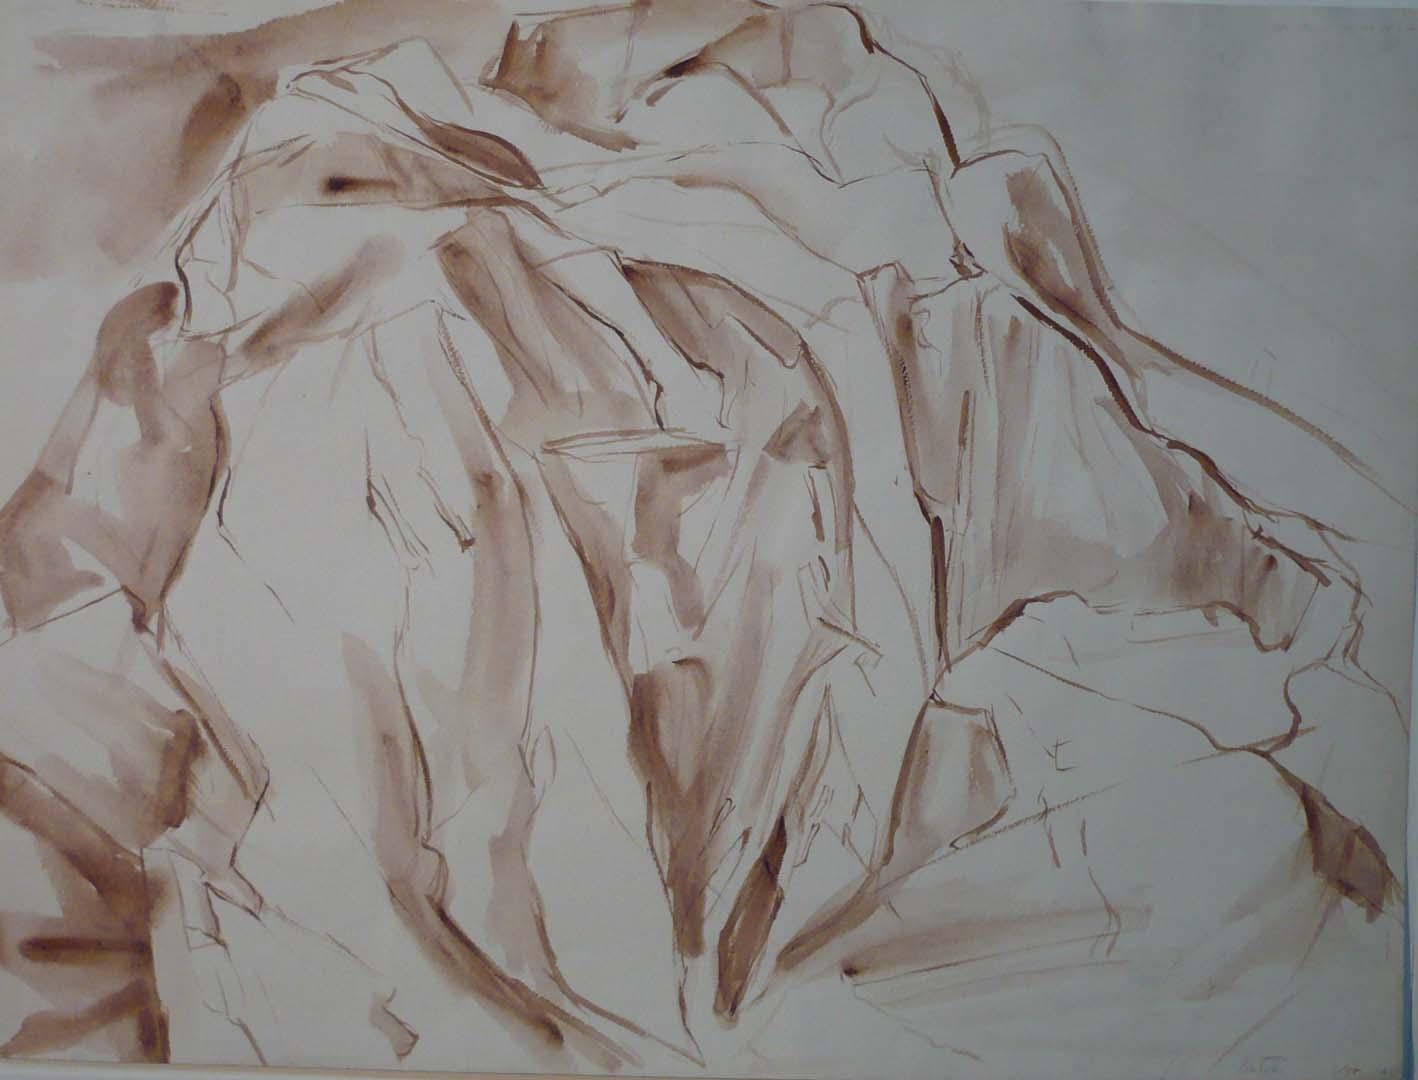 1955 Montauk Rocks #2 Sepia Wash on Paper 18 x 24